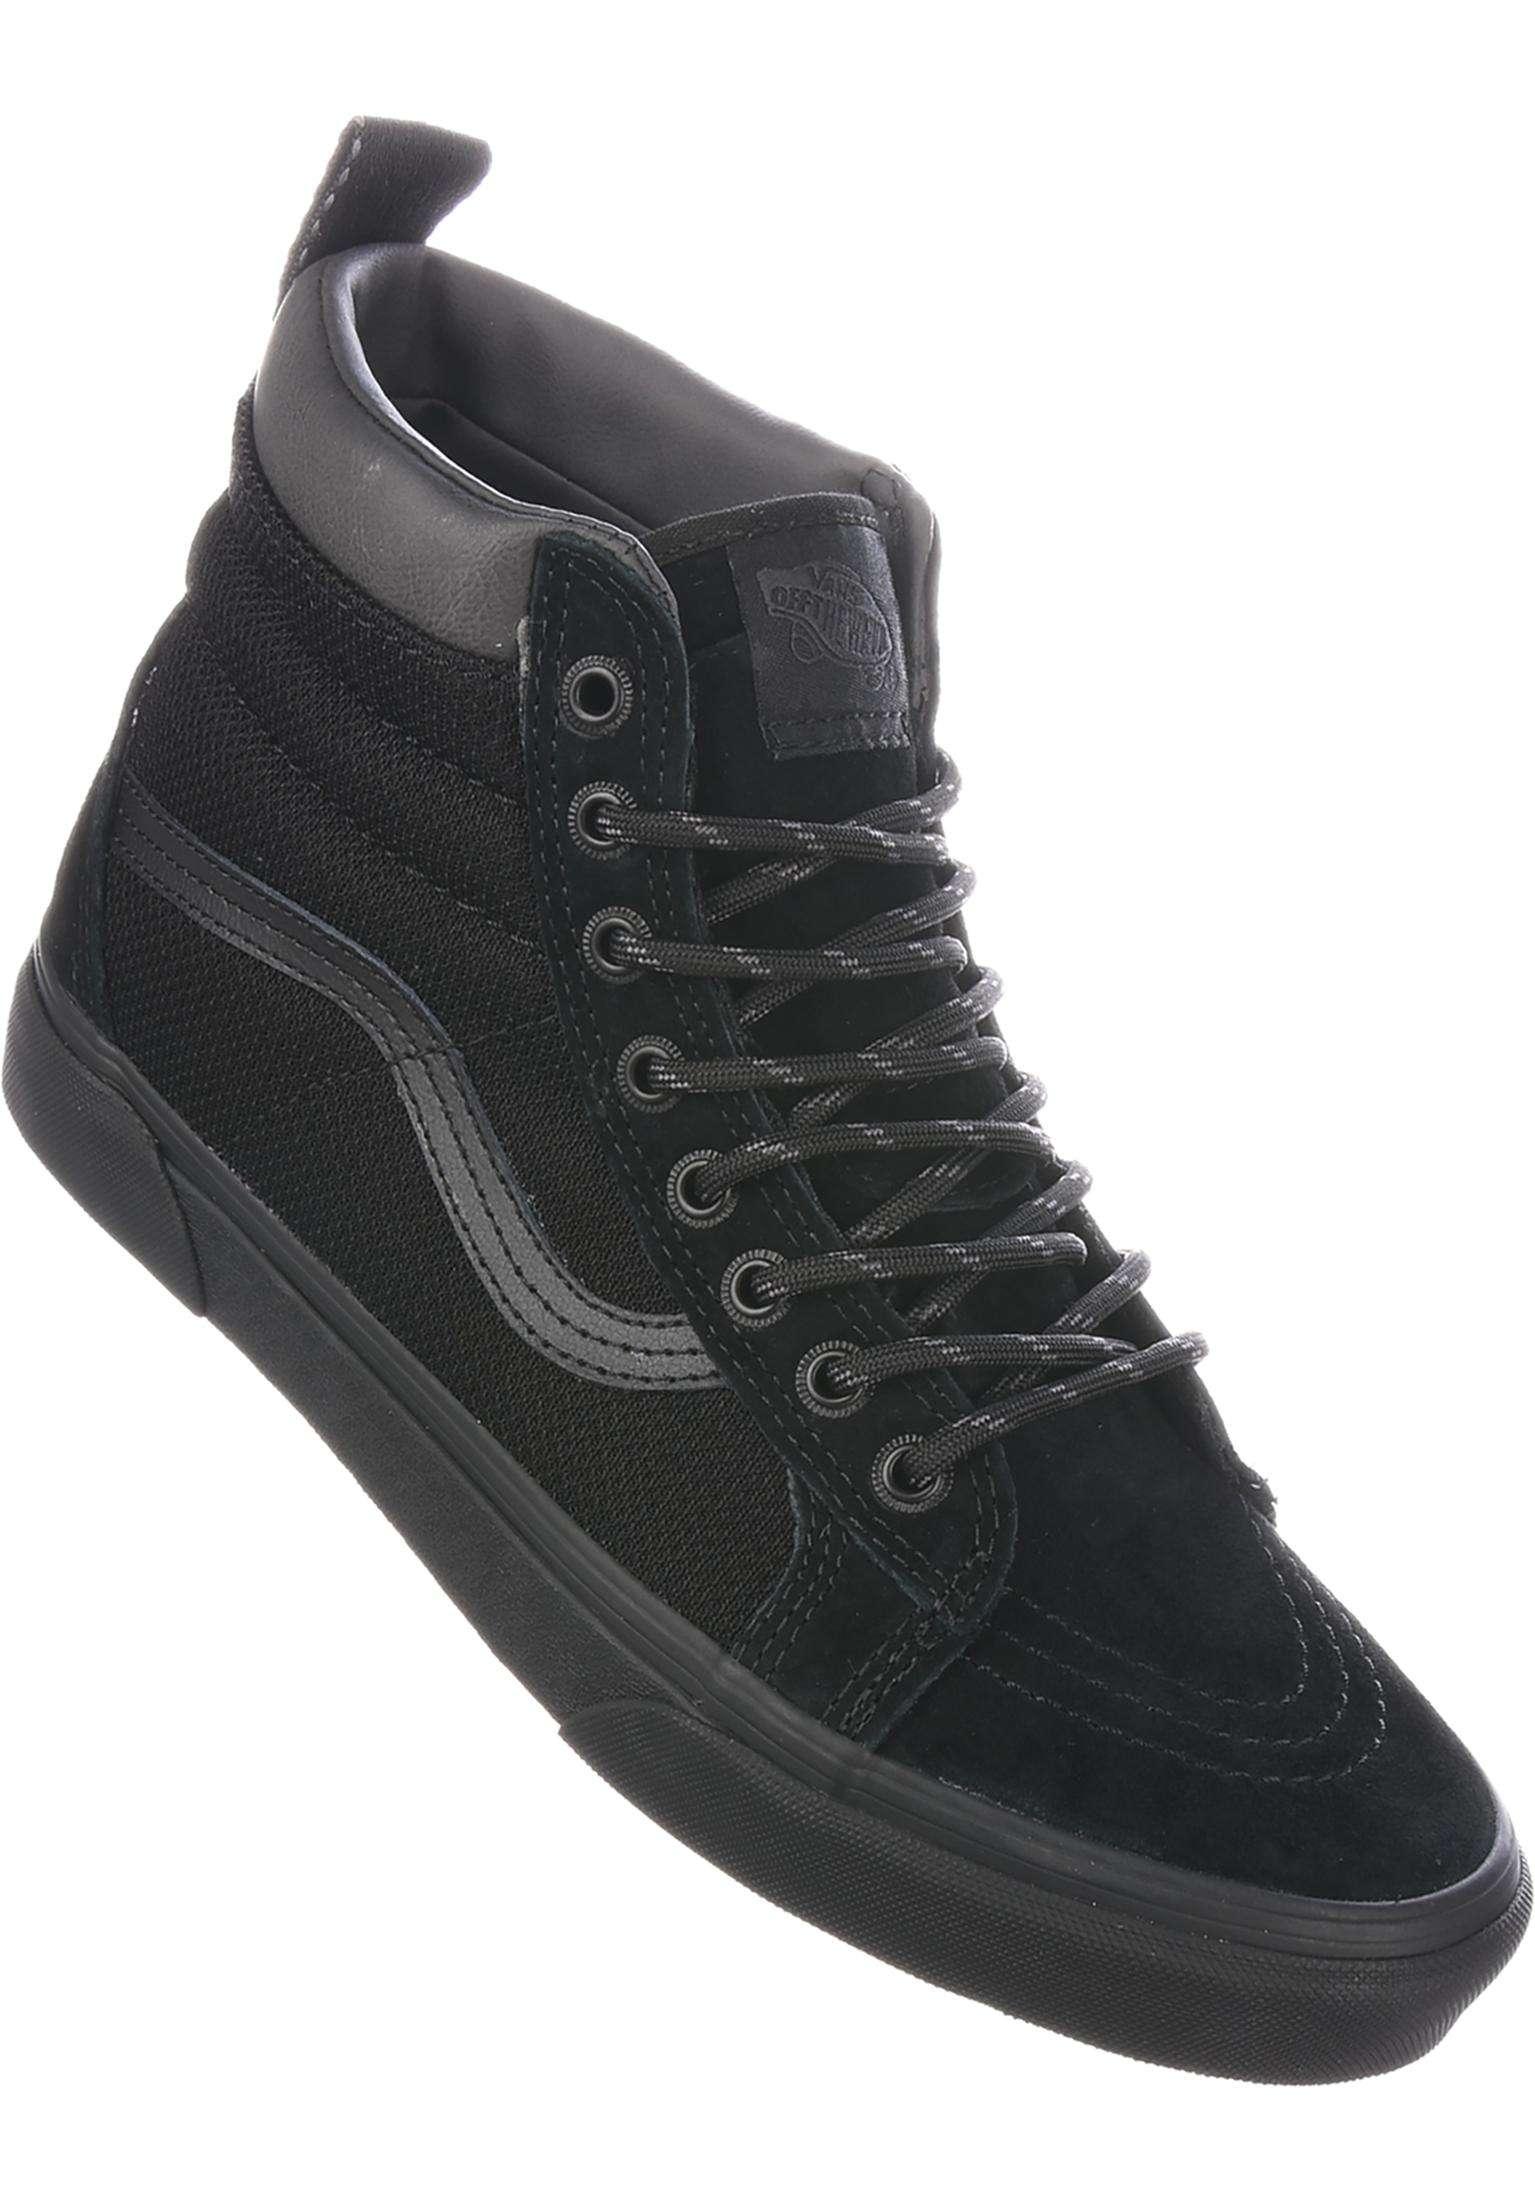 41e25c0932d7 Sk8 Hi MTE Vans All Shoes in black-ballistic for Men